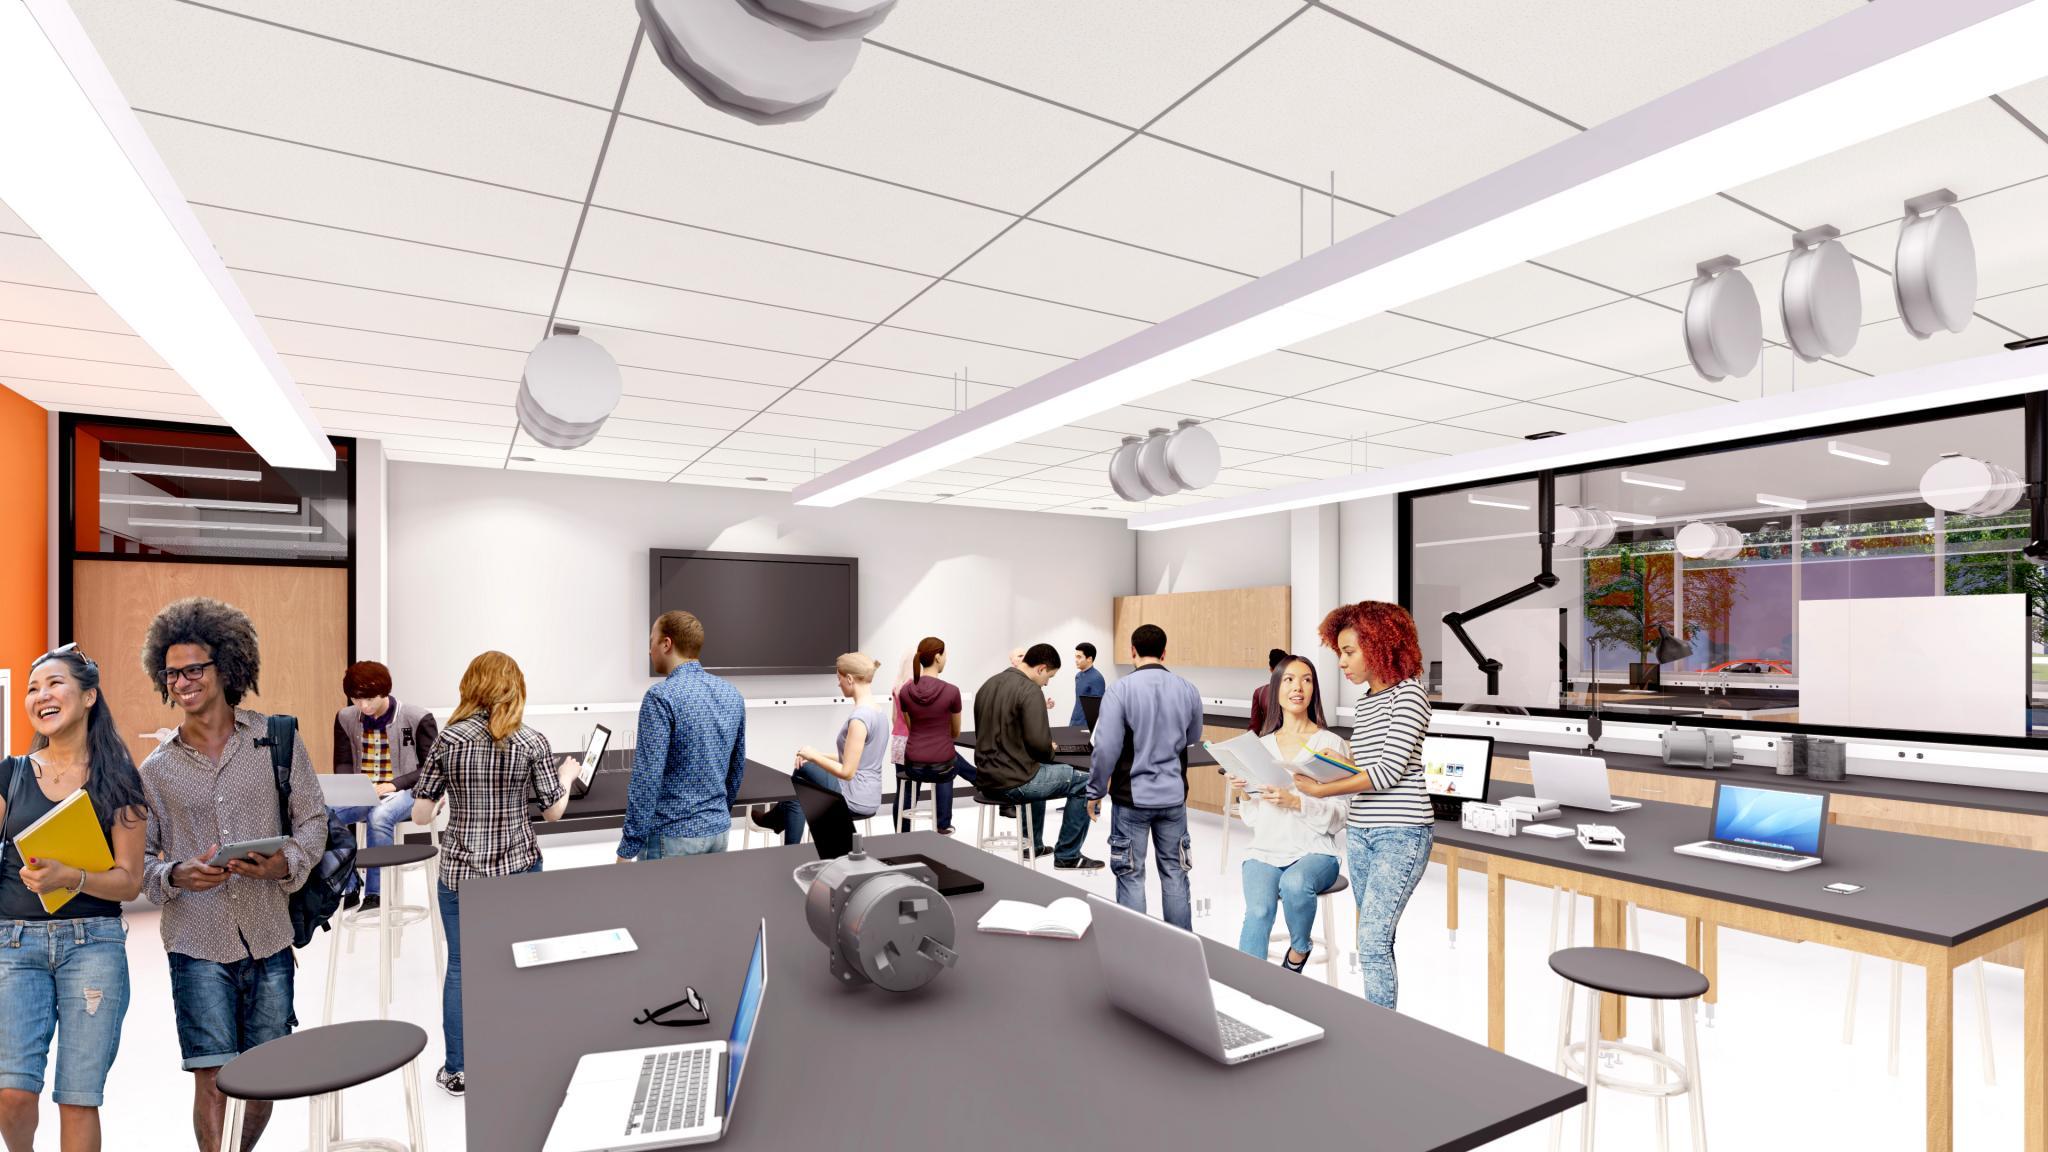 rendering of robotics lab